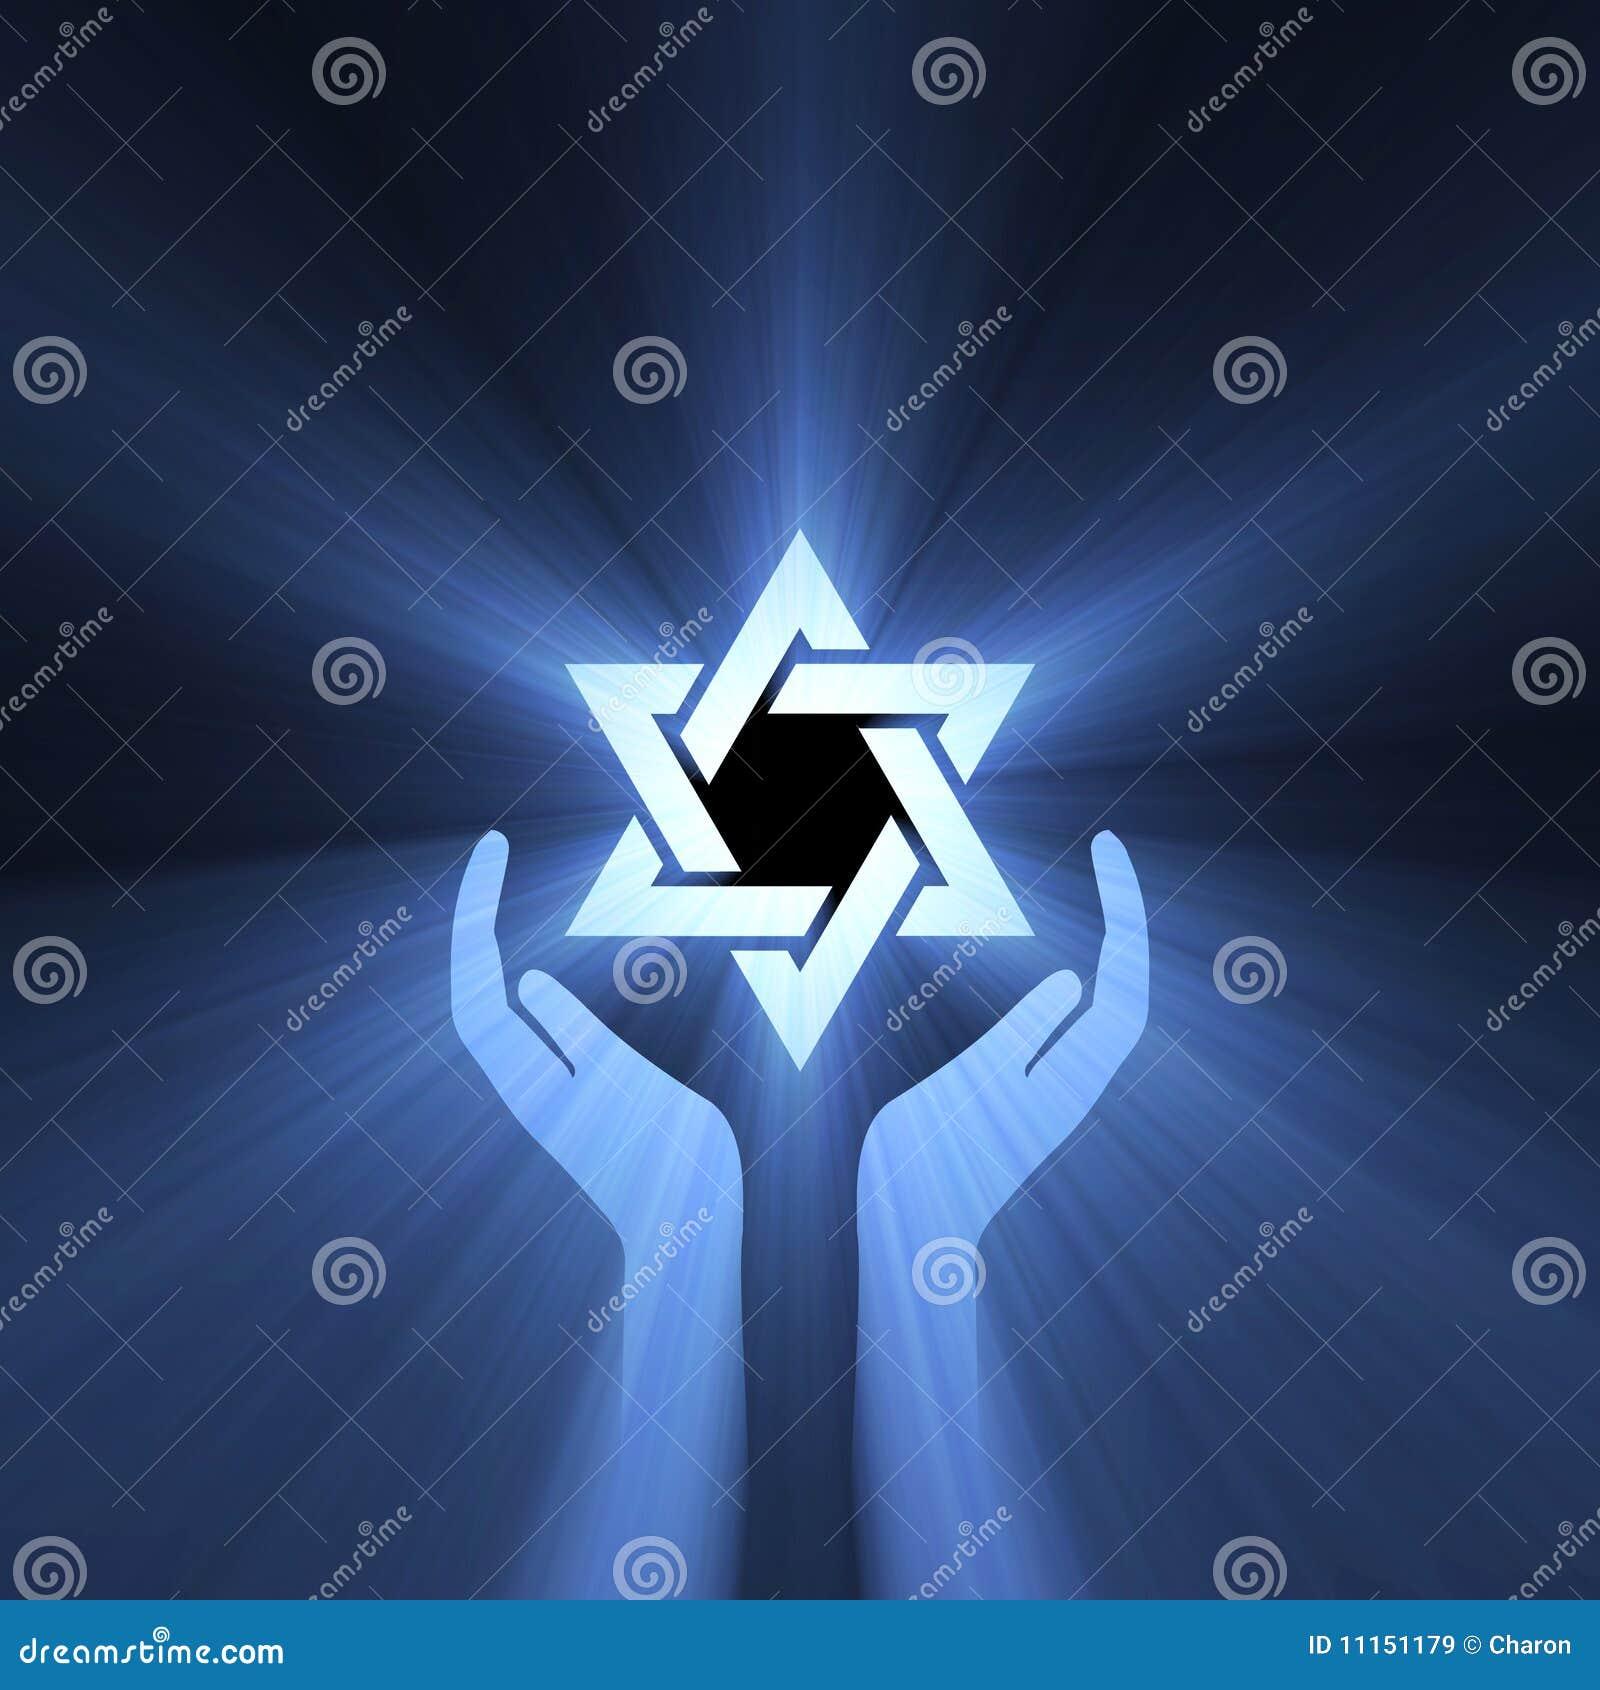 Star of David (Shield of David, Magen David) symbol with powerful blue ...